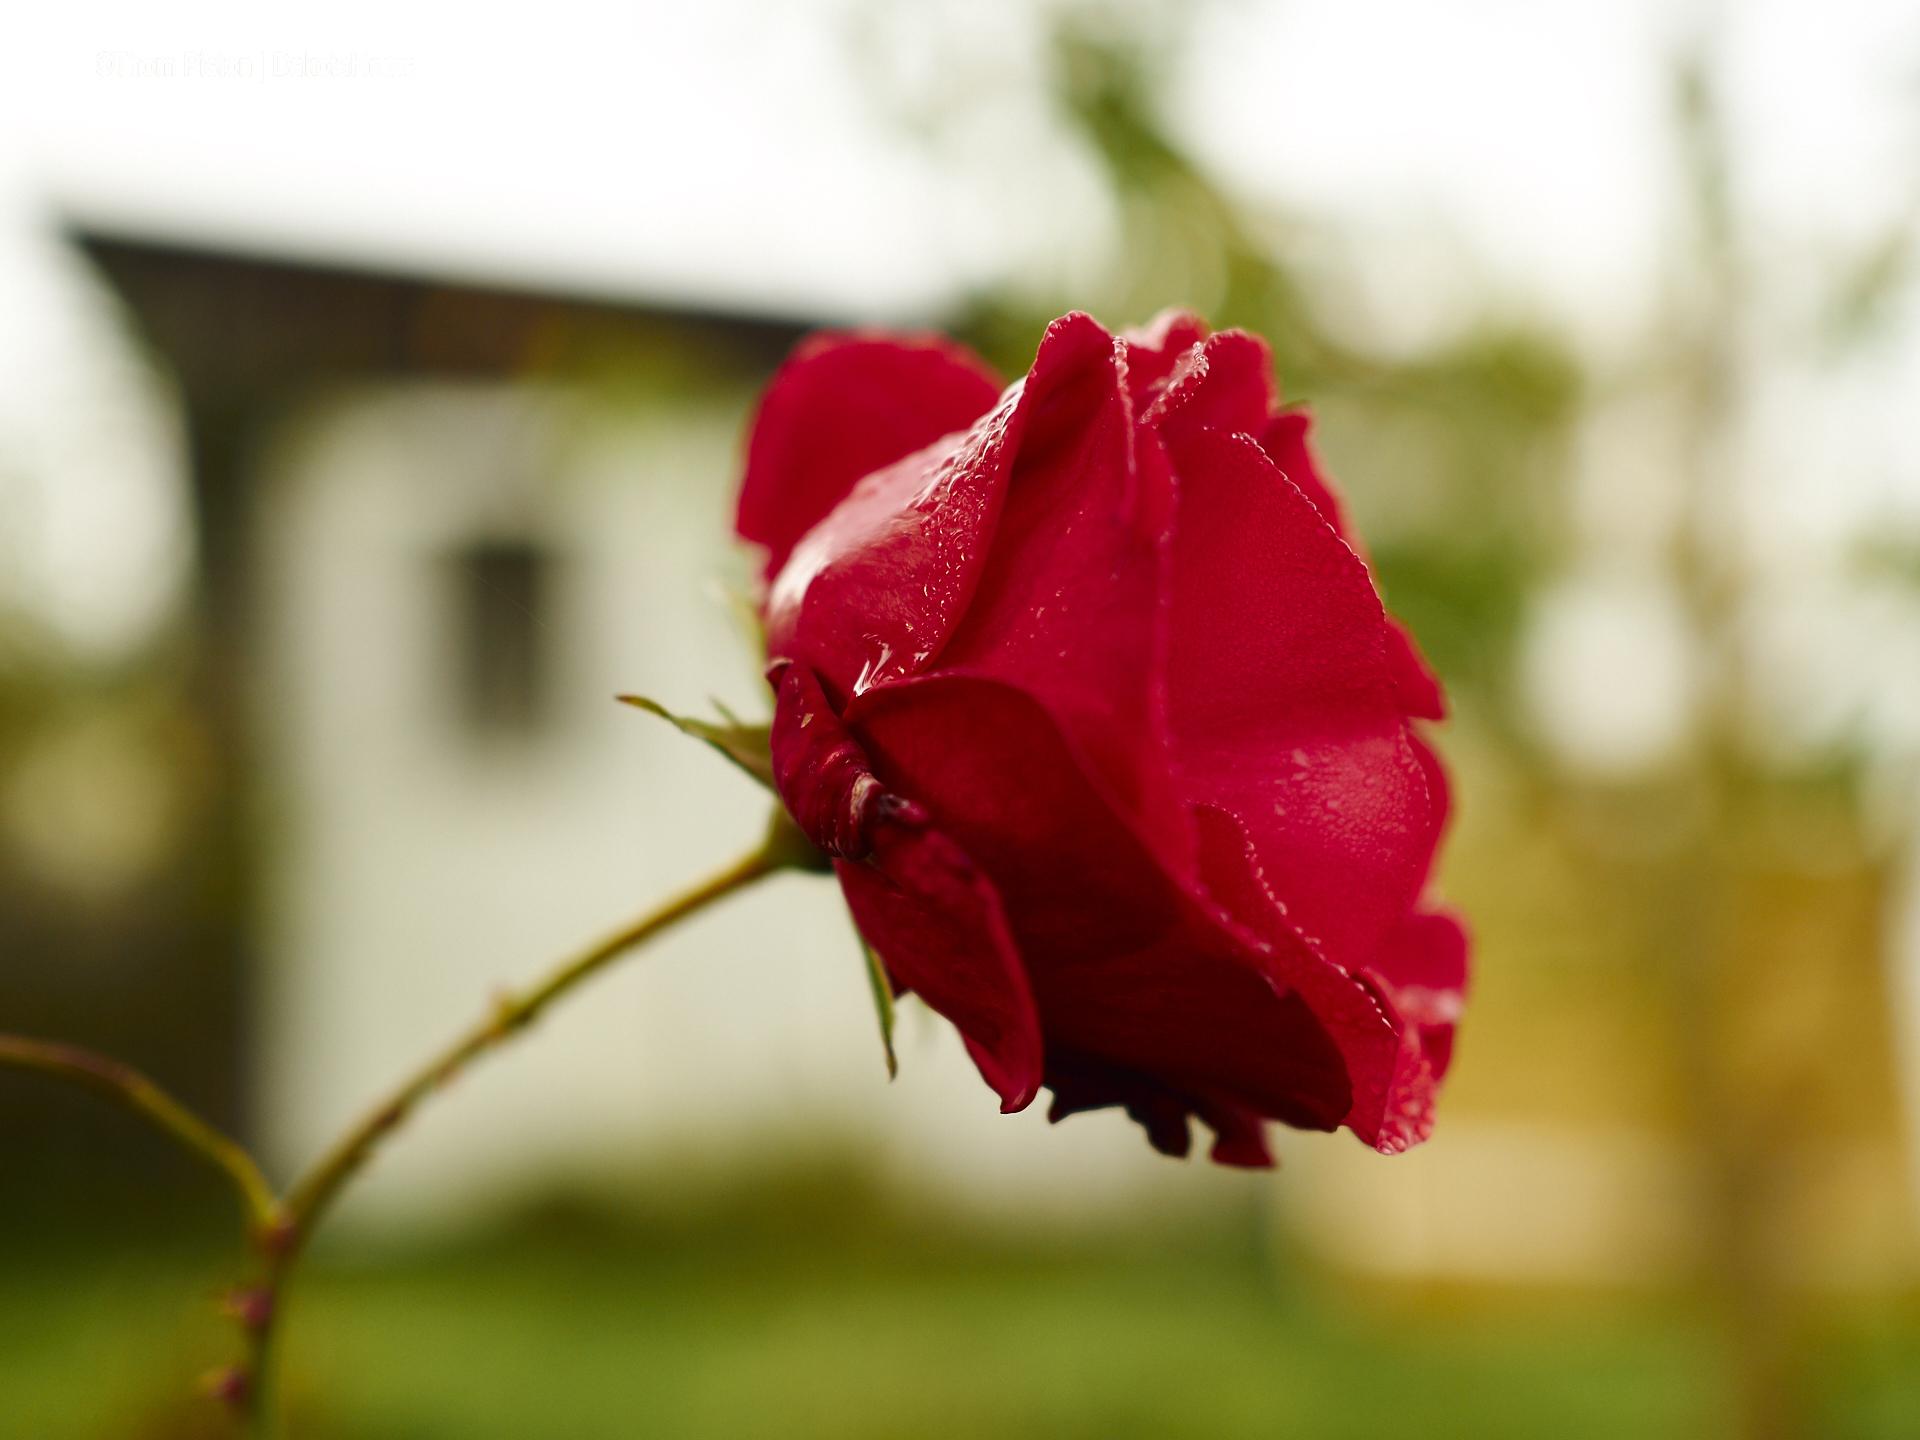 Rosen ende Oktober at Dakota HomeRosen ende Oktober at Dakota Home